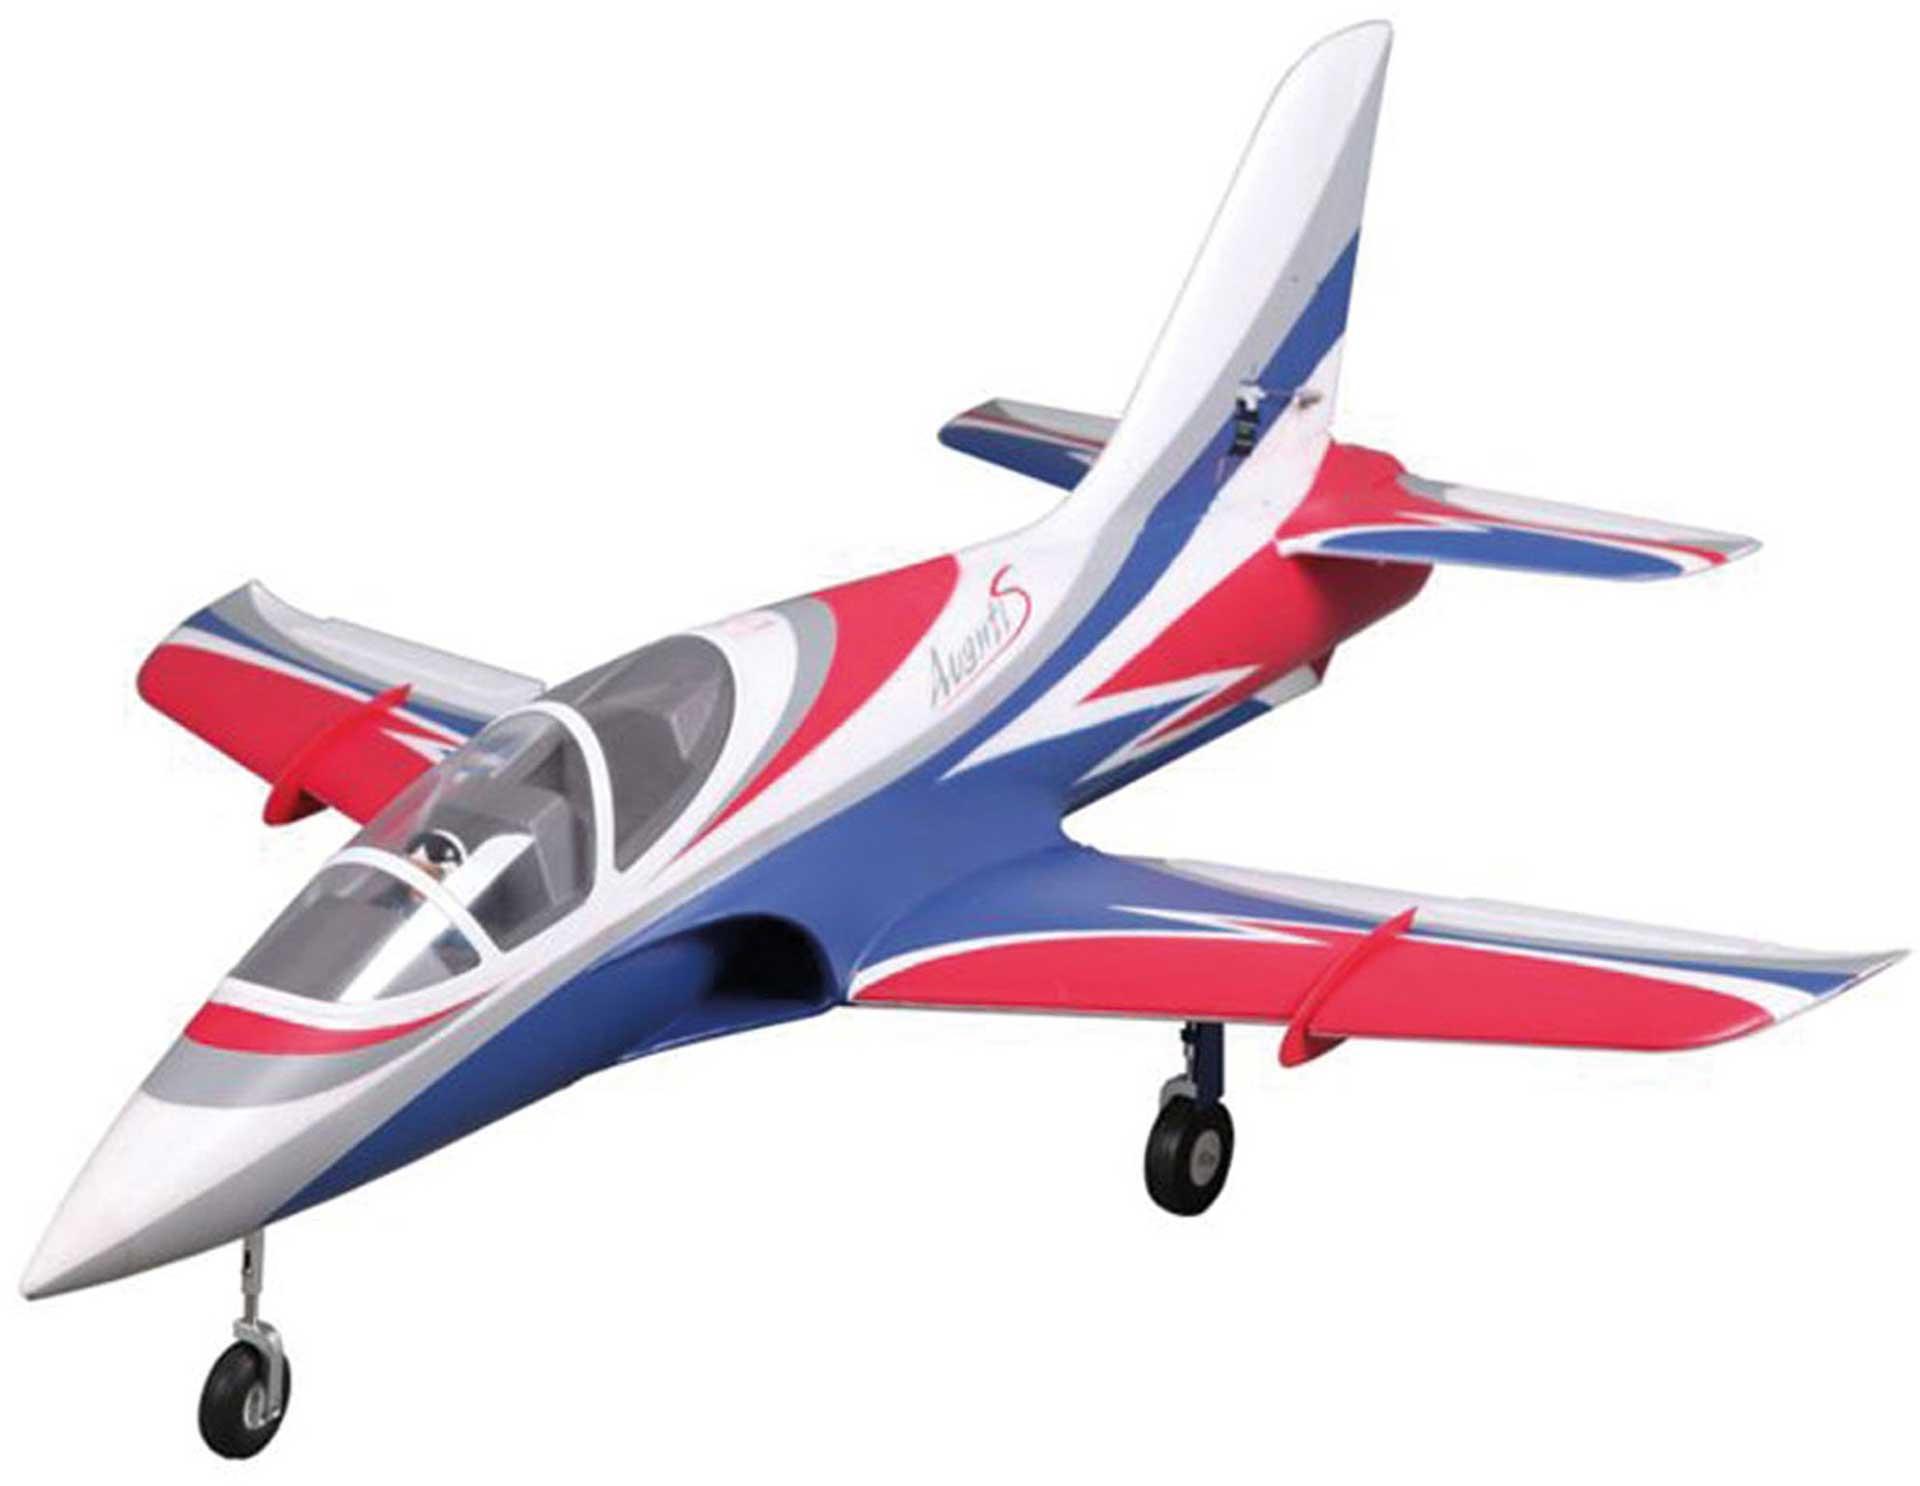 FMS MINI AVANTI Foam Jet 6S PNP 70mm EDF Classic Sebart Design